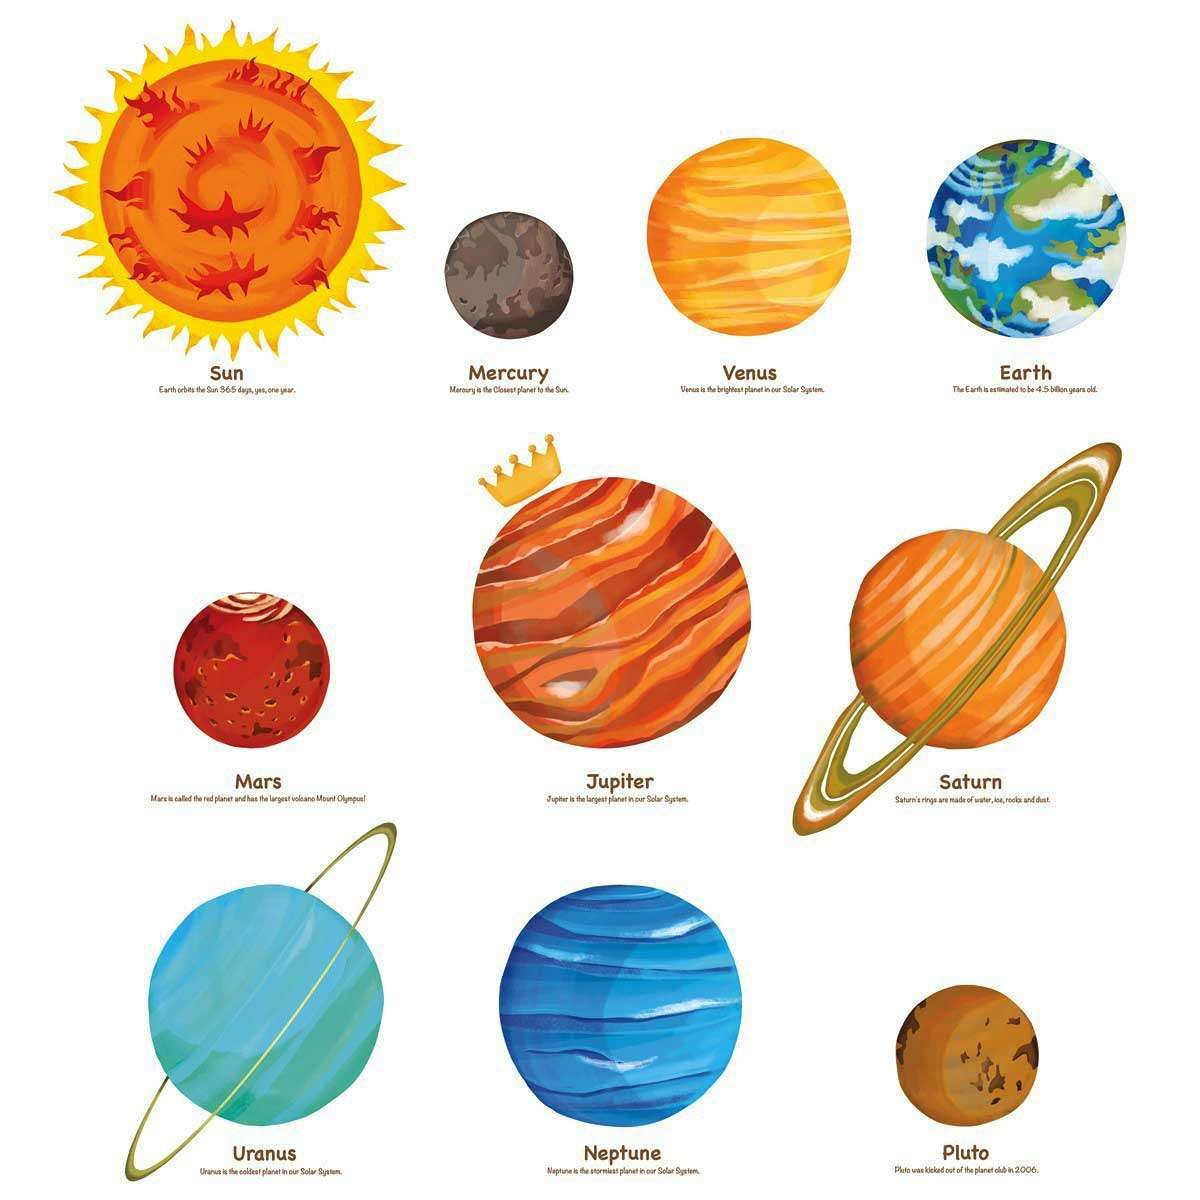 Wandsticker Sonnensystem Planeten In 2020 Sonnensystem Planeten Sonnensystem Planeten